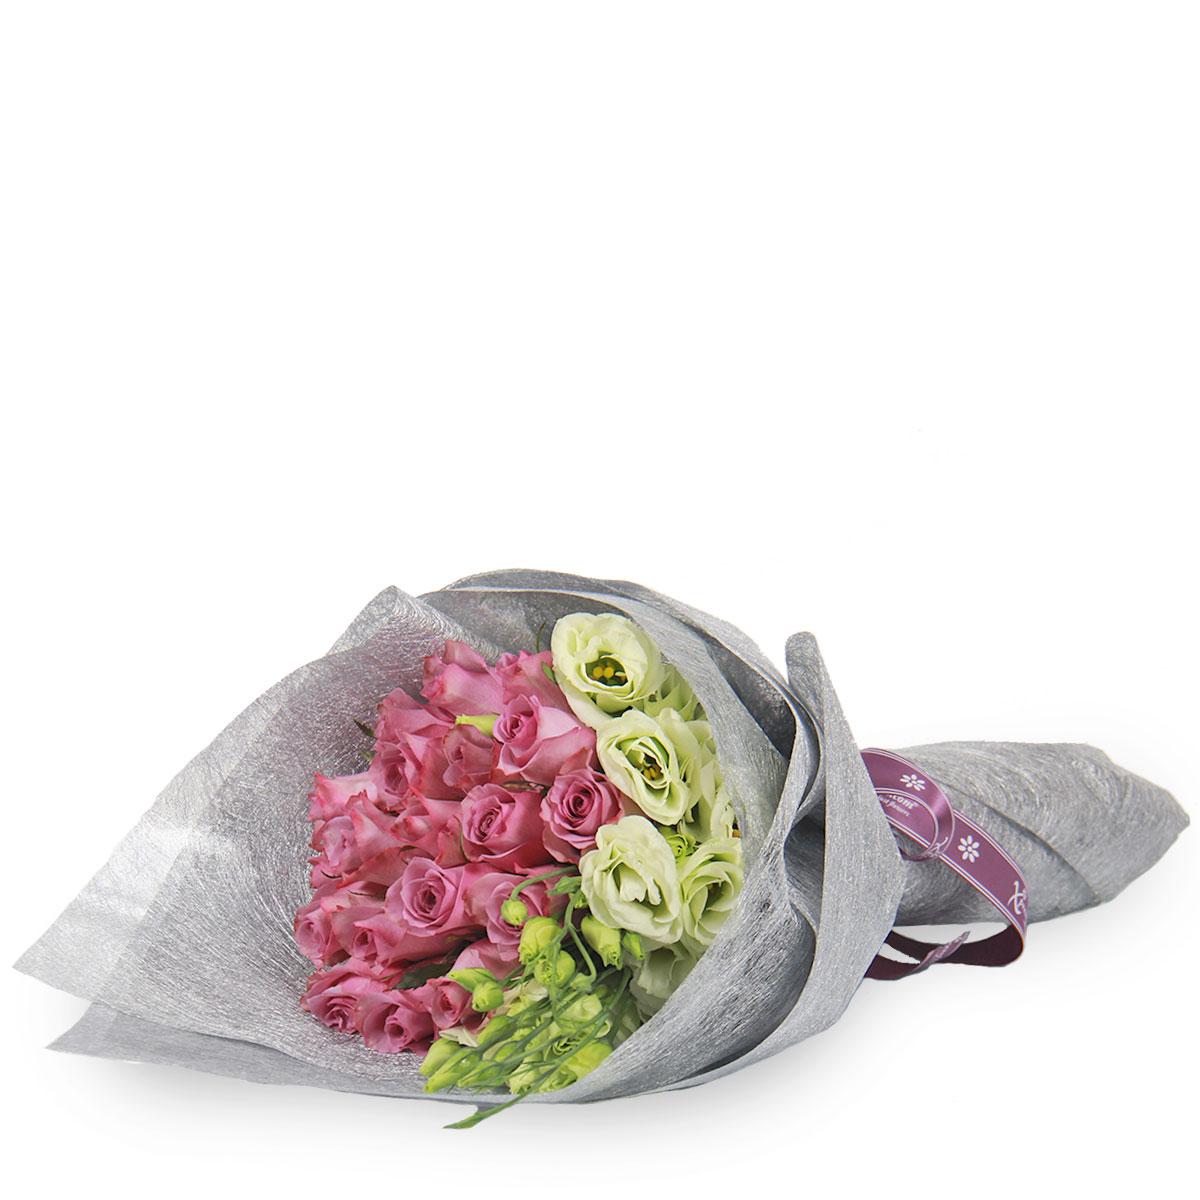 BQ1736 lush splendor yam purple roses